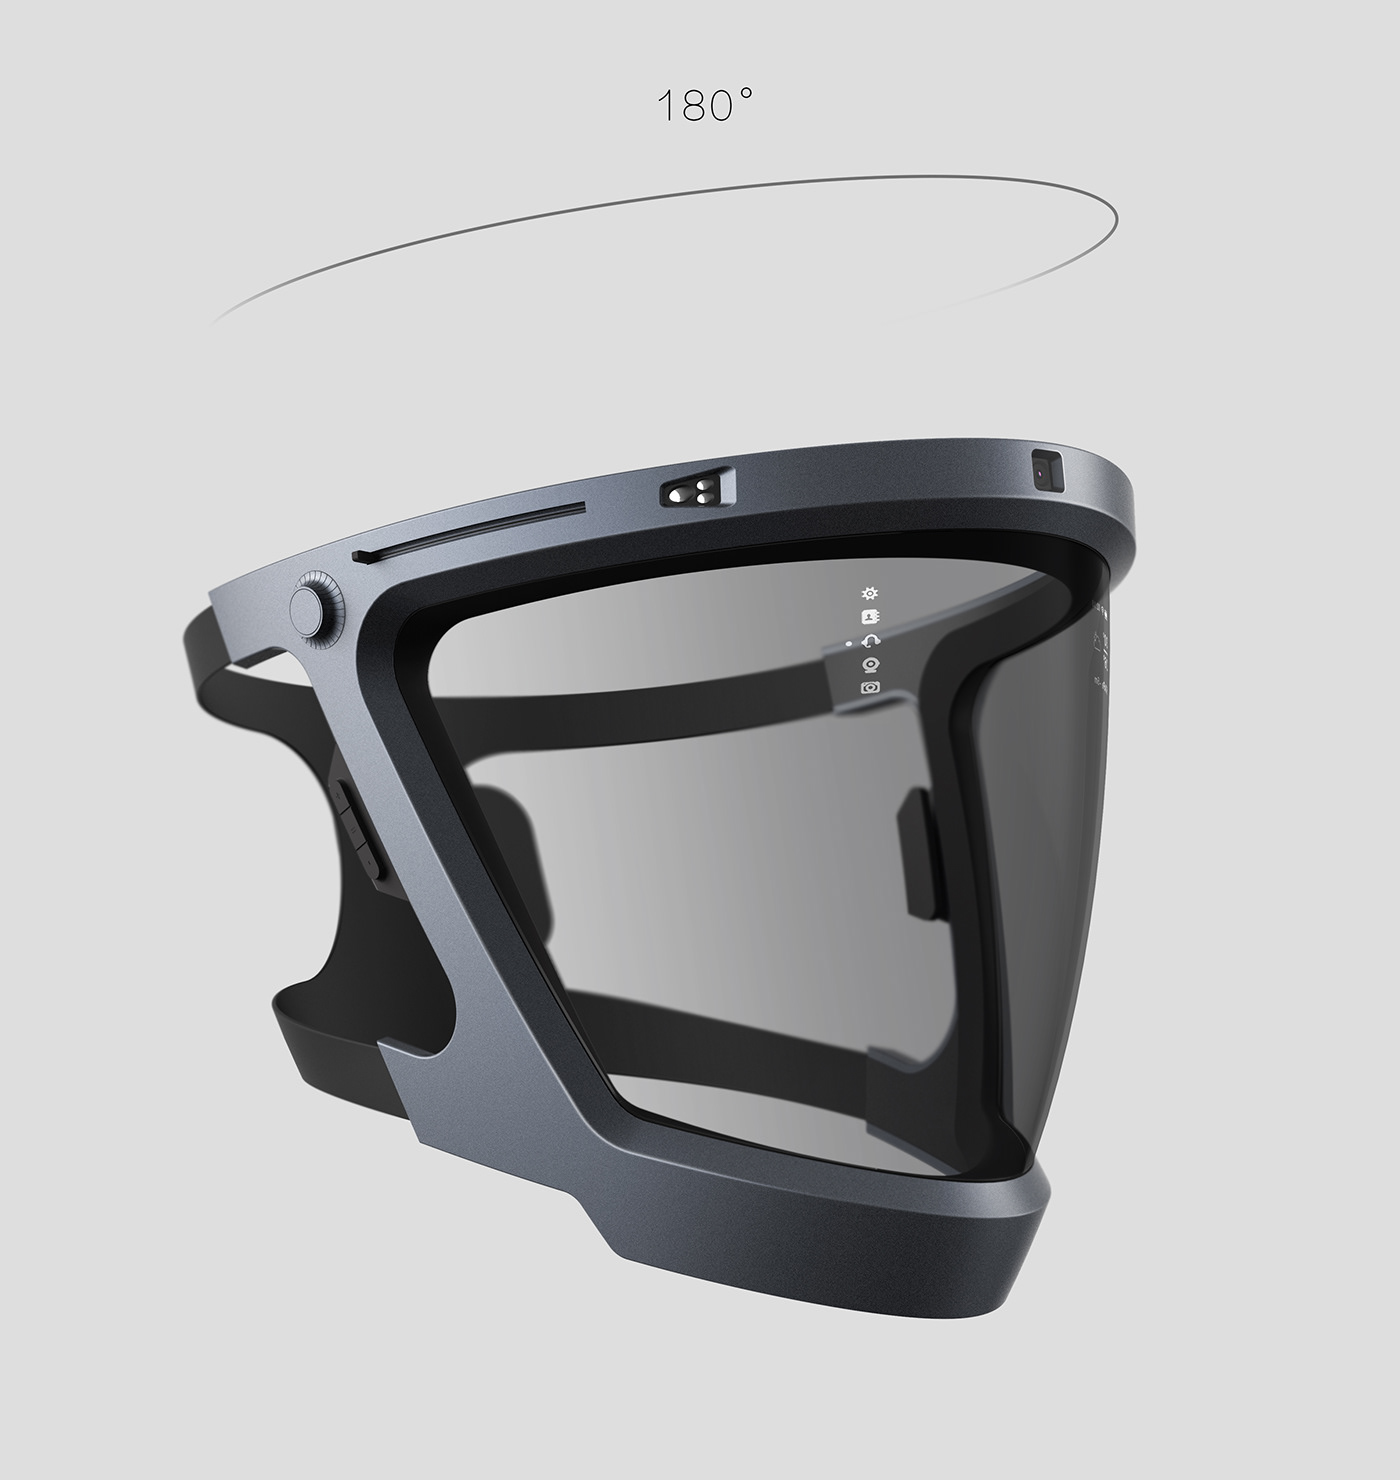 smart-diving-d-mask-concept-noko-04.jpg